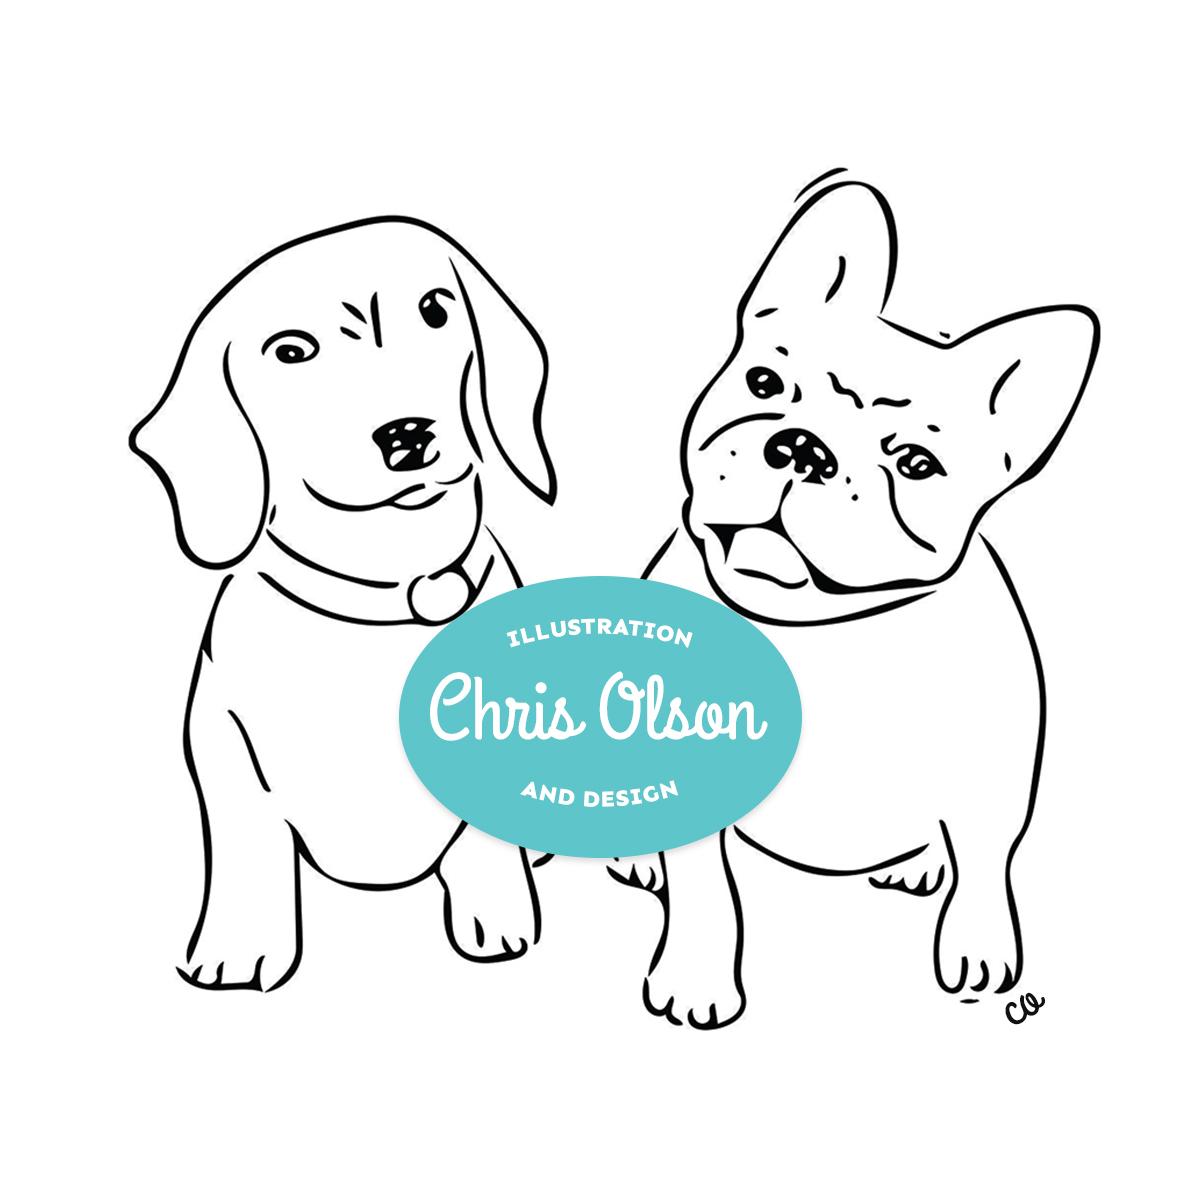 Dachshund and French Bulldog illustration by Chris Olson